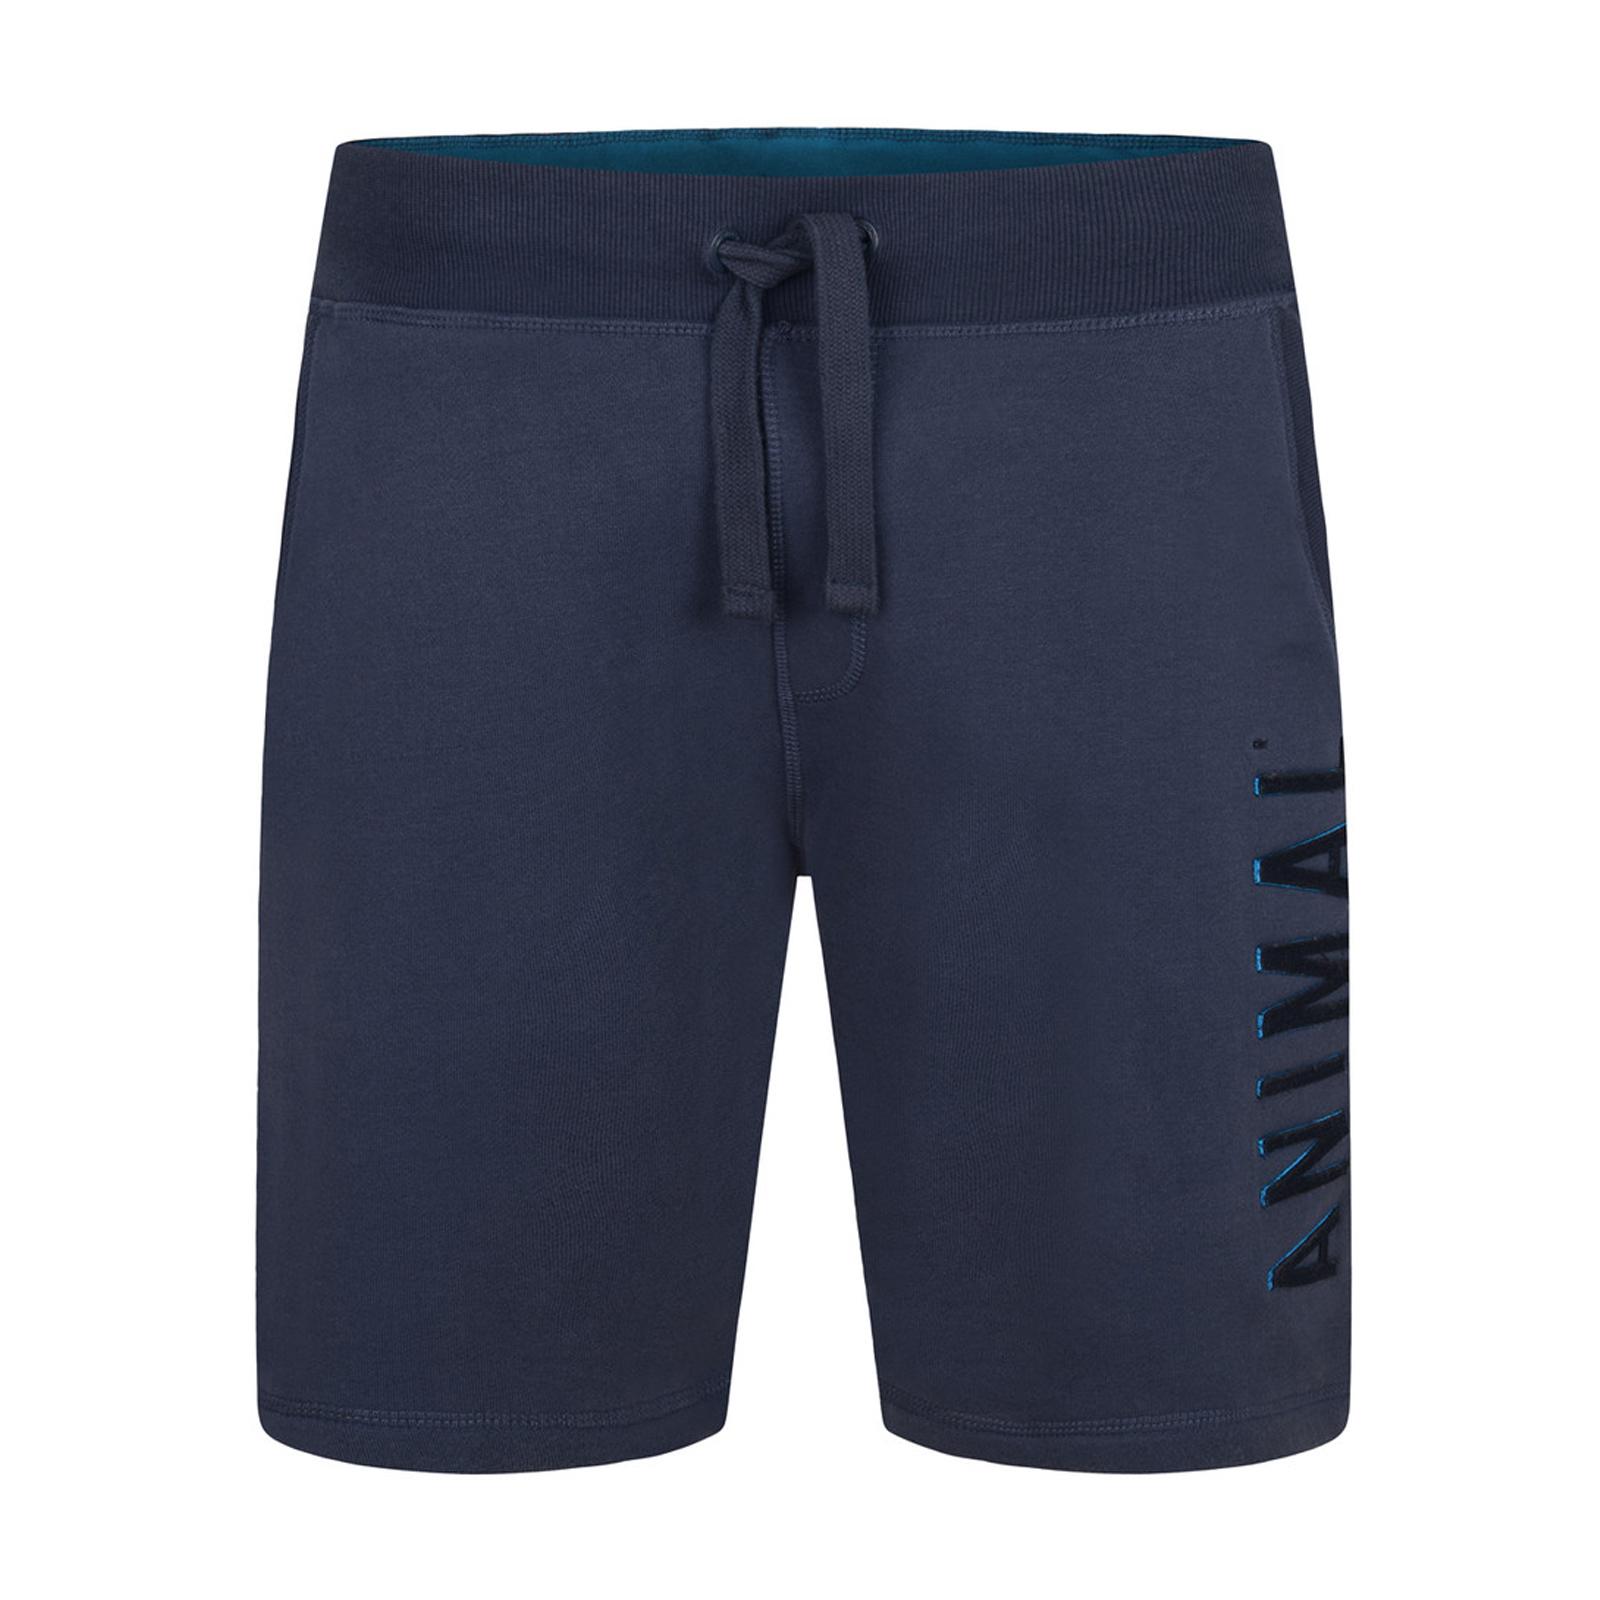 ponsford men Animal ponsford shorts - indigo blue b01bn8bezc  1950s/1960s western style ,rockabilly, retro, vintage men\'s shirt b06xhpgckh.